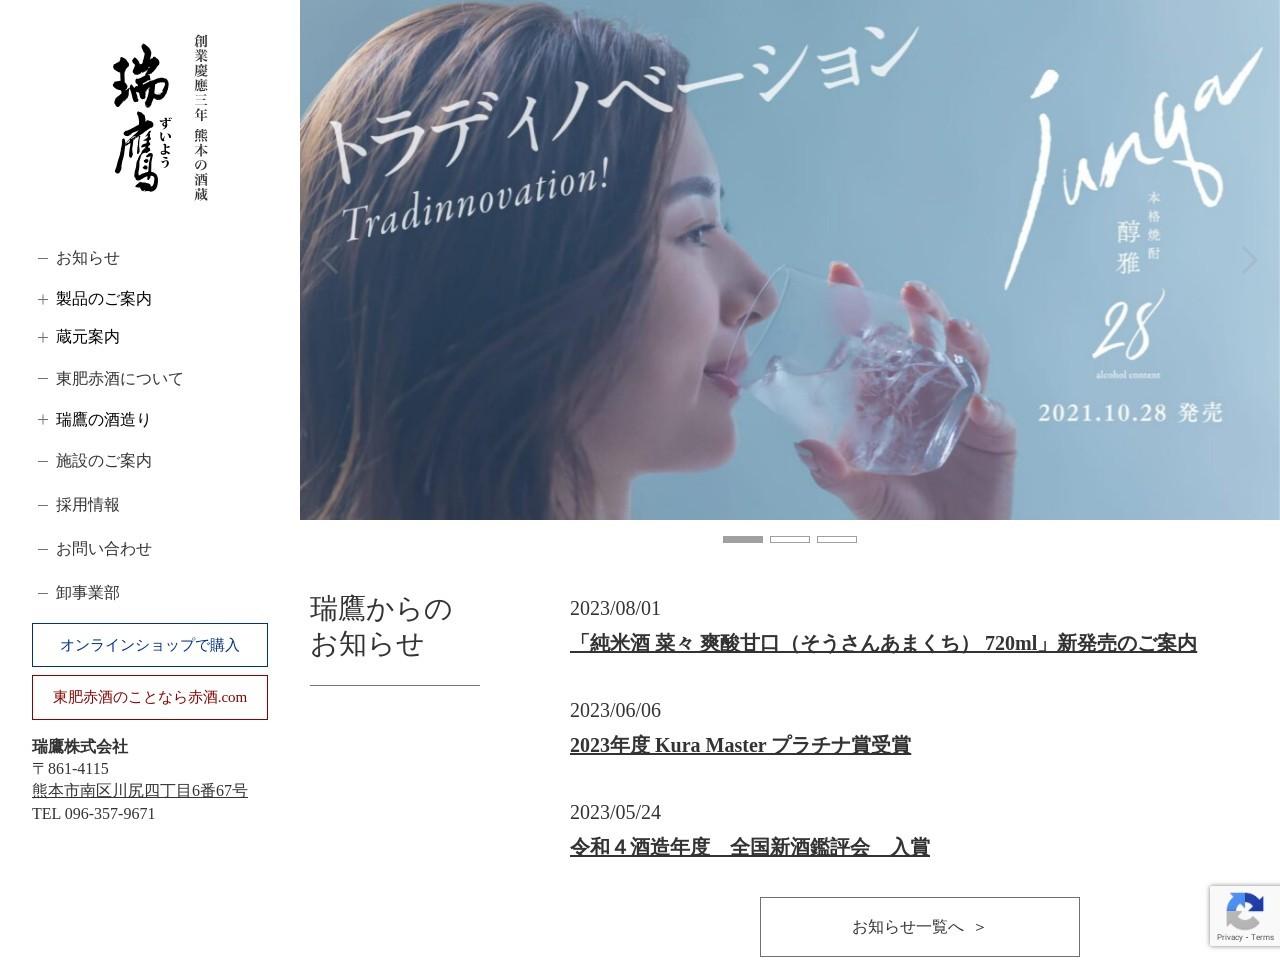 熊本の日本酒【瑞鷹】肥後の地酒【東肥赤酒】 瑞鷹株式会社